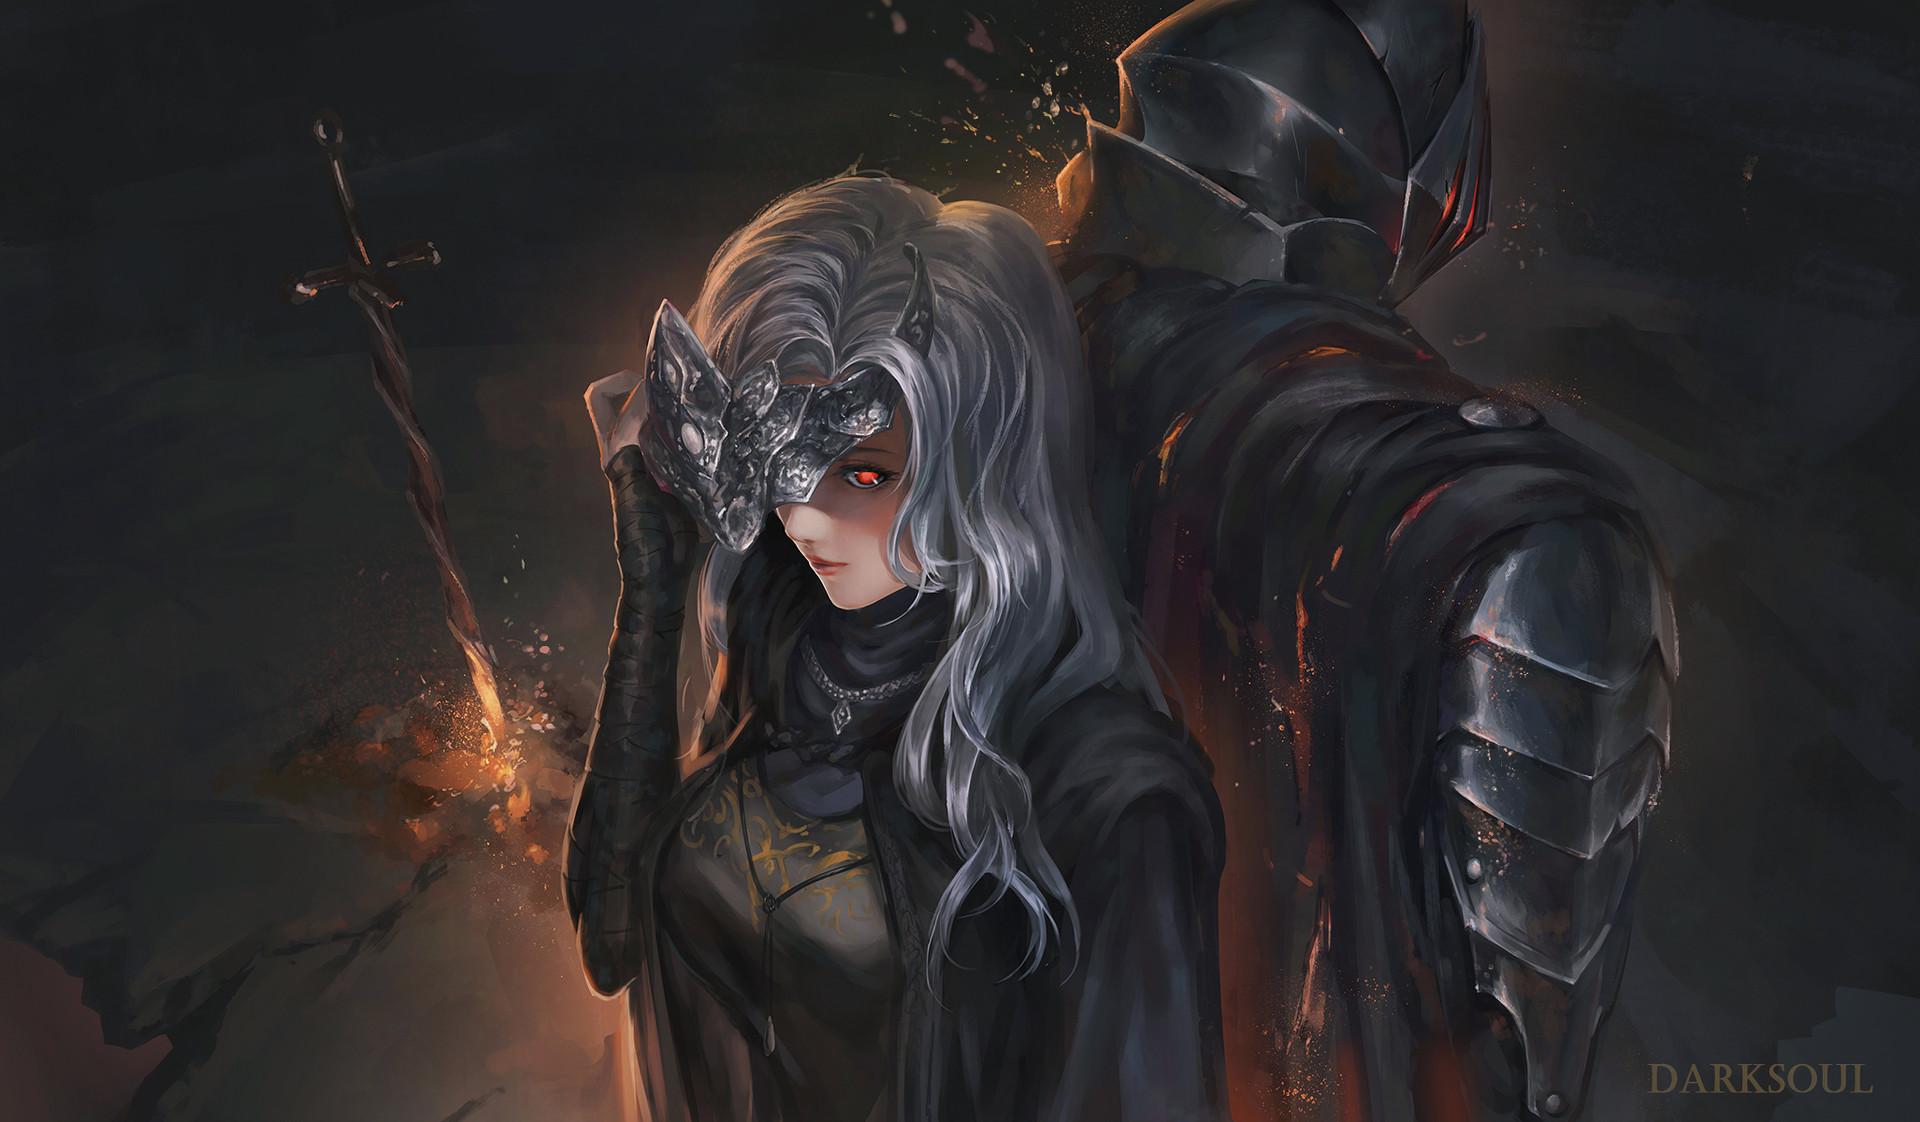 Dark Souls 3 Firekeeper Wallpaper Dark Souls 3 Fire Keeper X